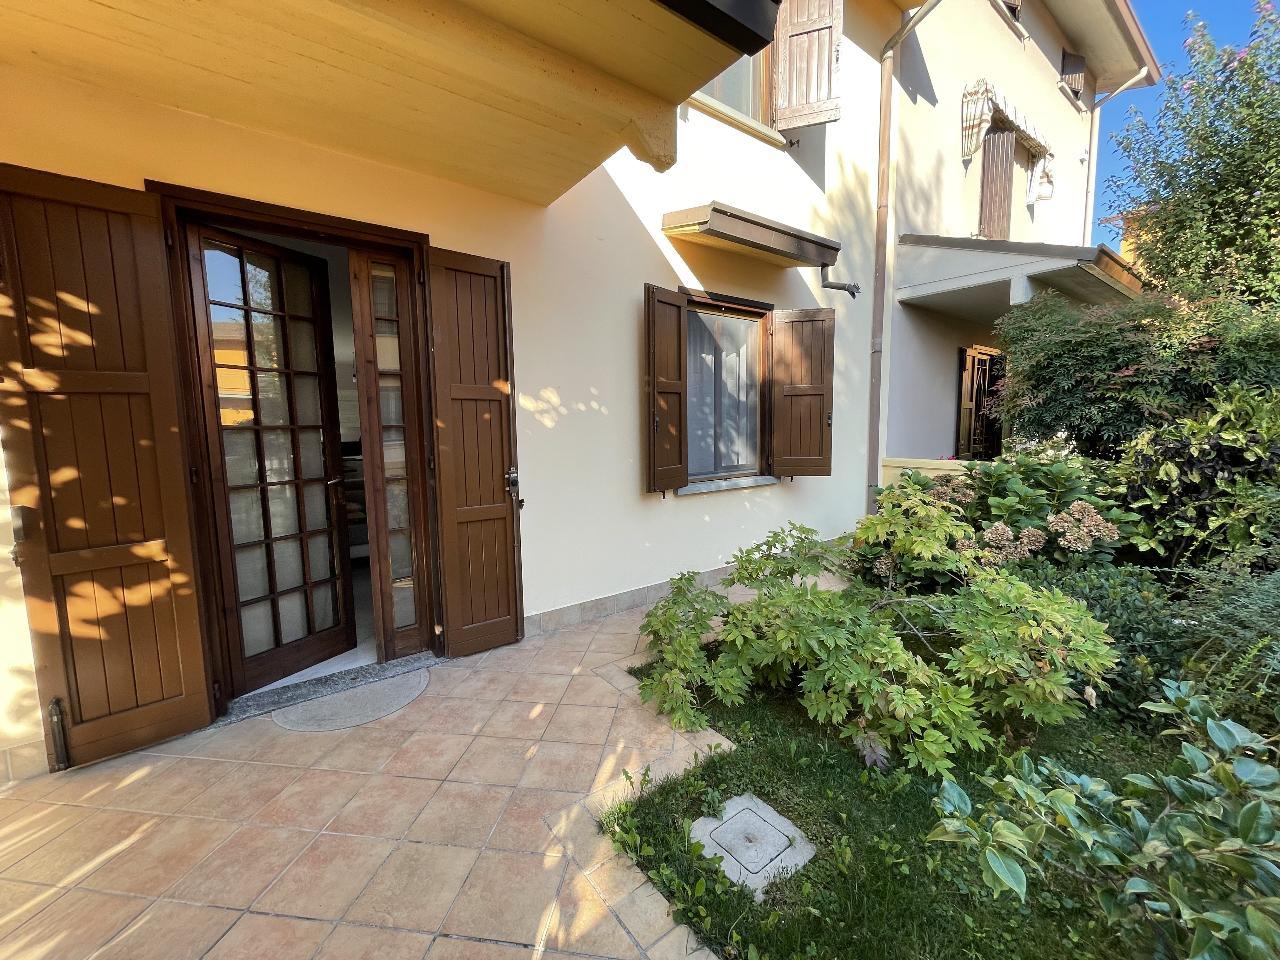 Villa a schiera CASTELVERDE Euro 260.000,00